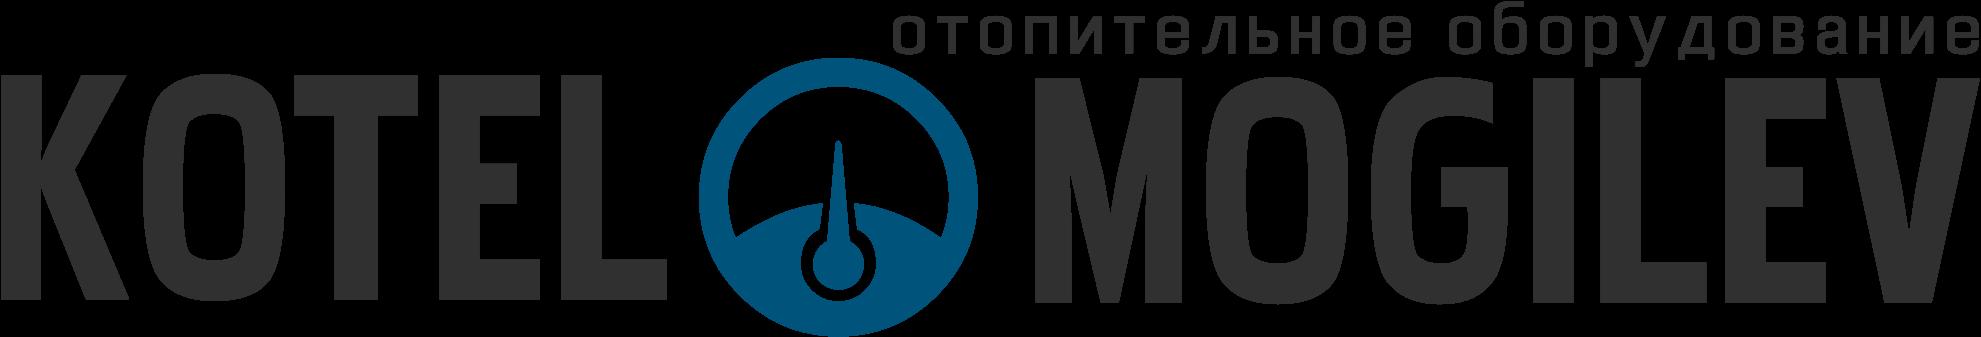 Котел-Могилев.бай